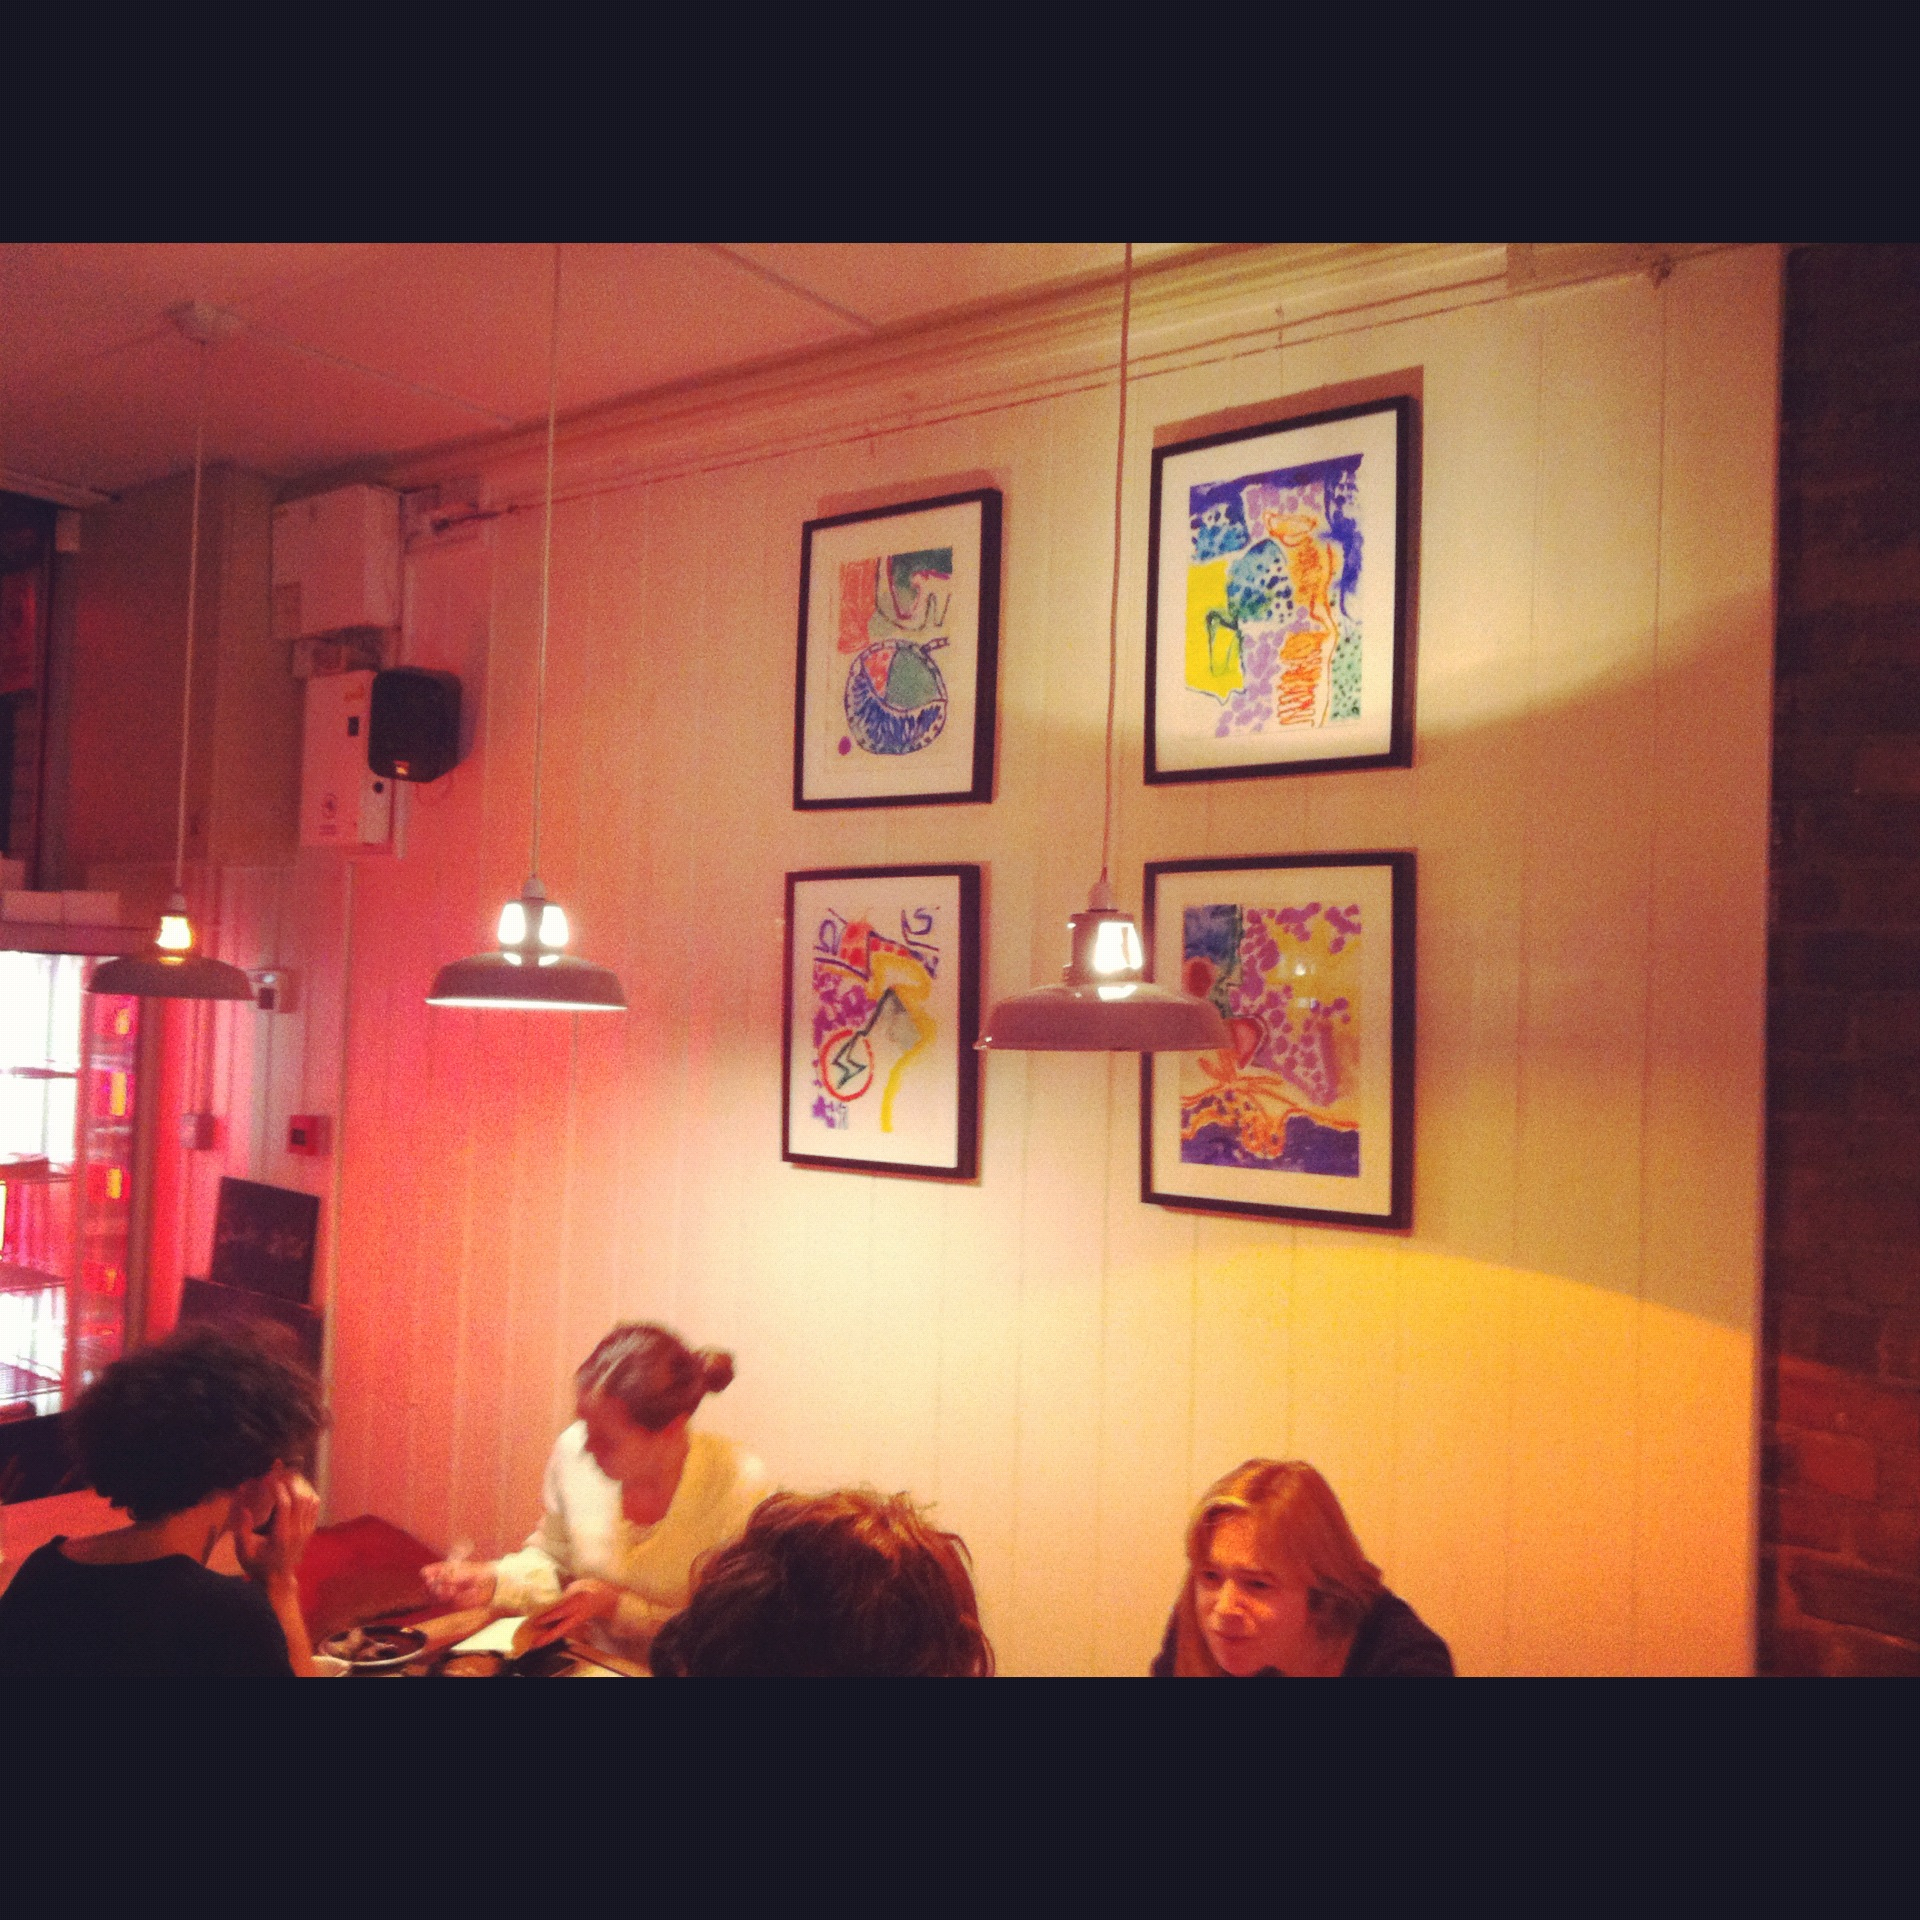 Photo 12-12-2011 17 15 34.jpg